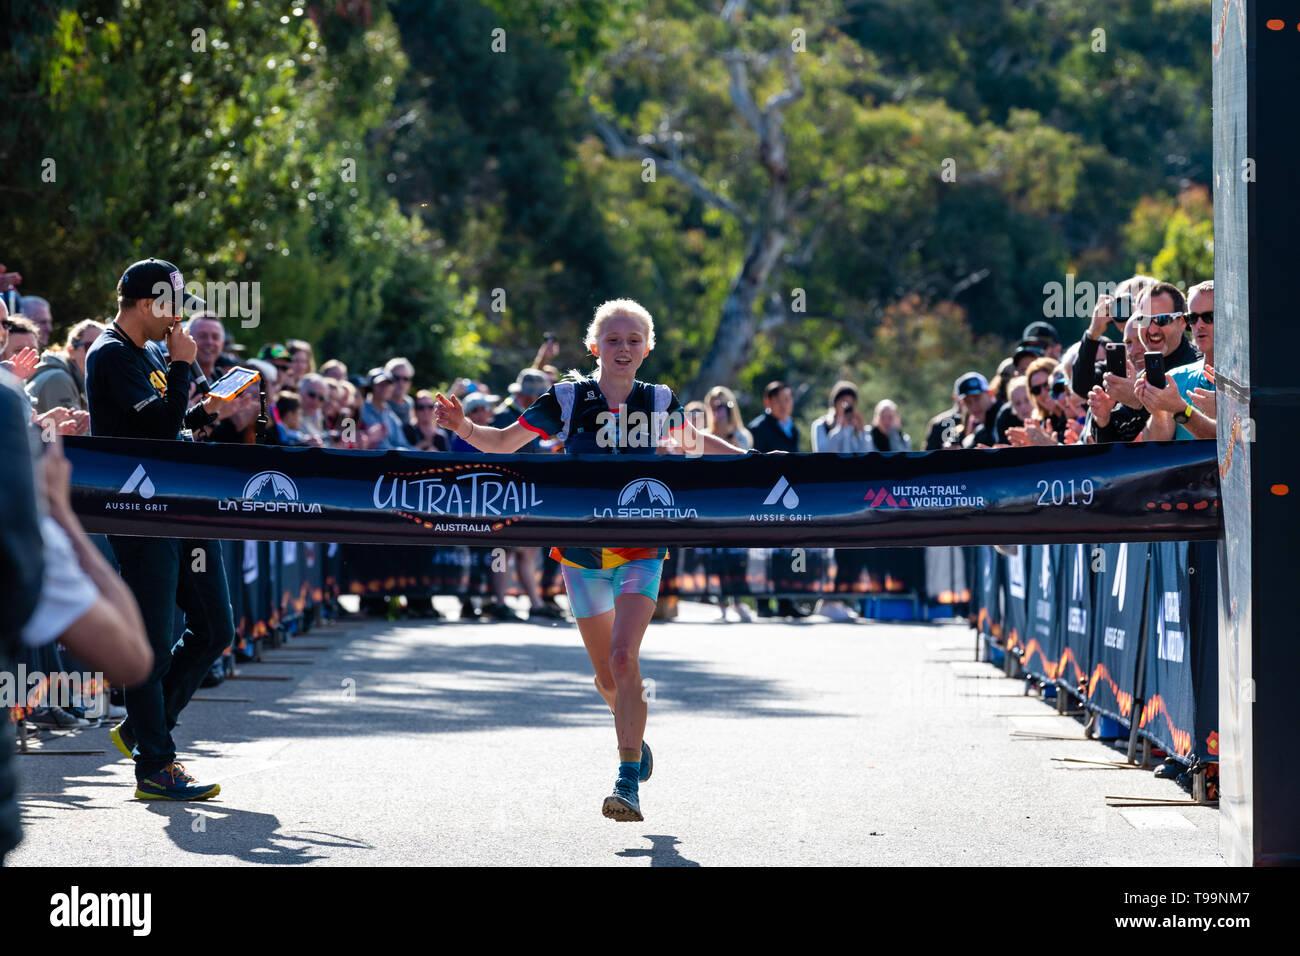 Blue Mountains, Australia - April 16 2019: Ultra-Trail Australia UTA11 race. Runner Paige Penrose, winner of the womens event, at the finish line, abo - Stock Image